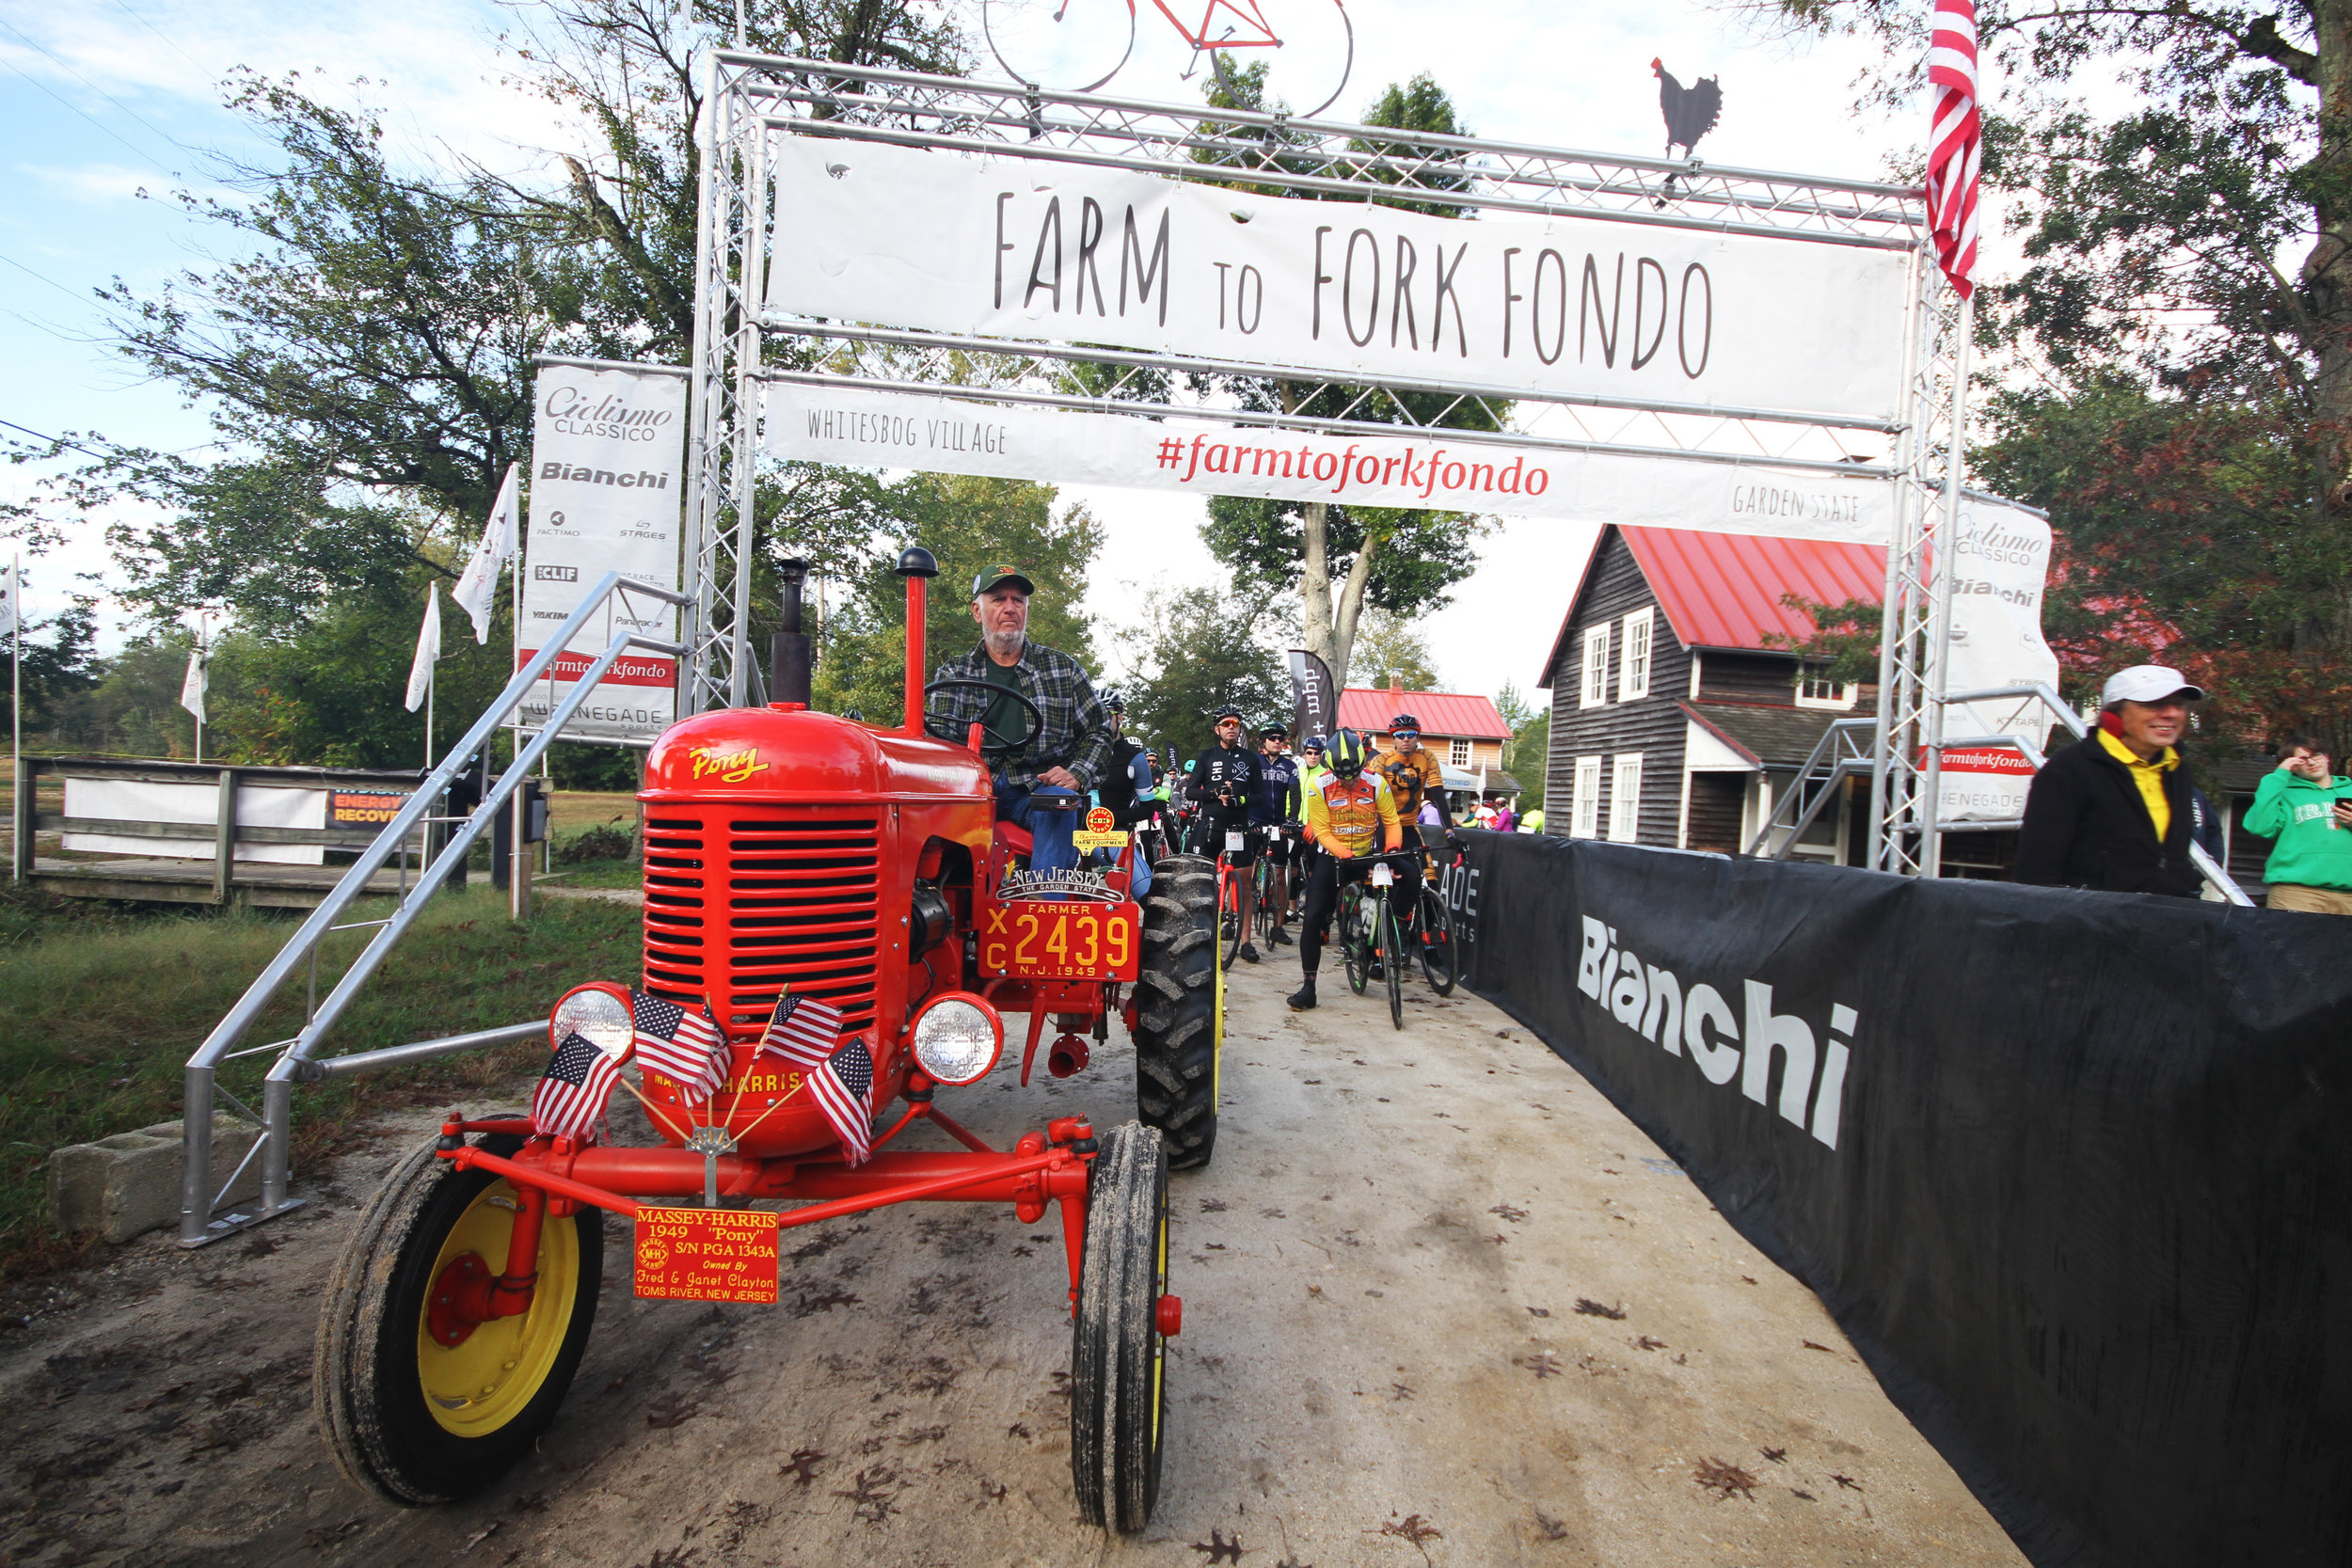 Farm to Fork Fondo 2018